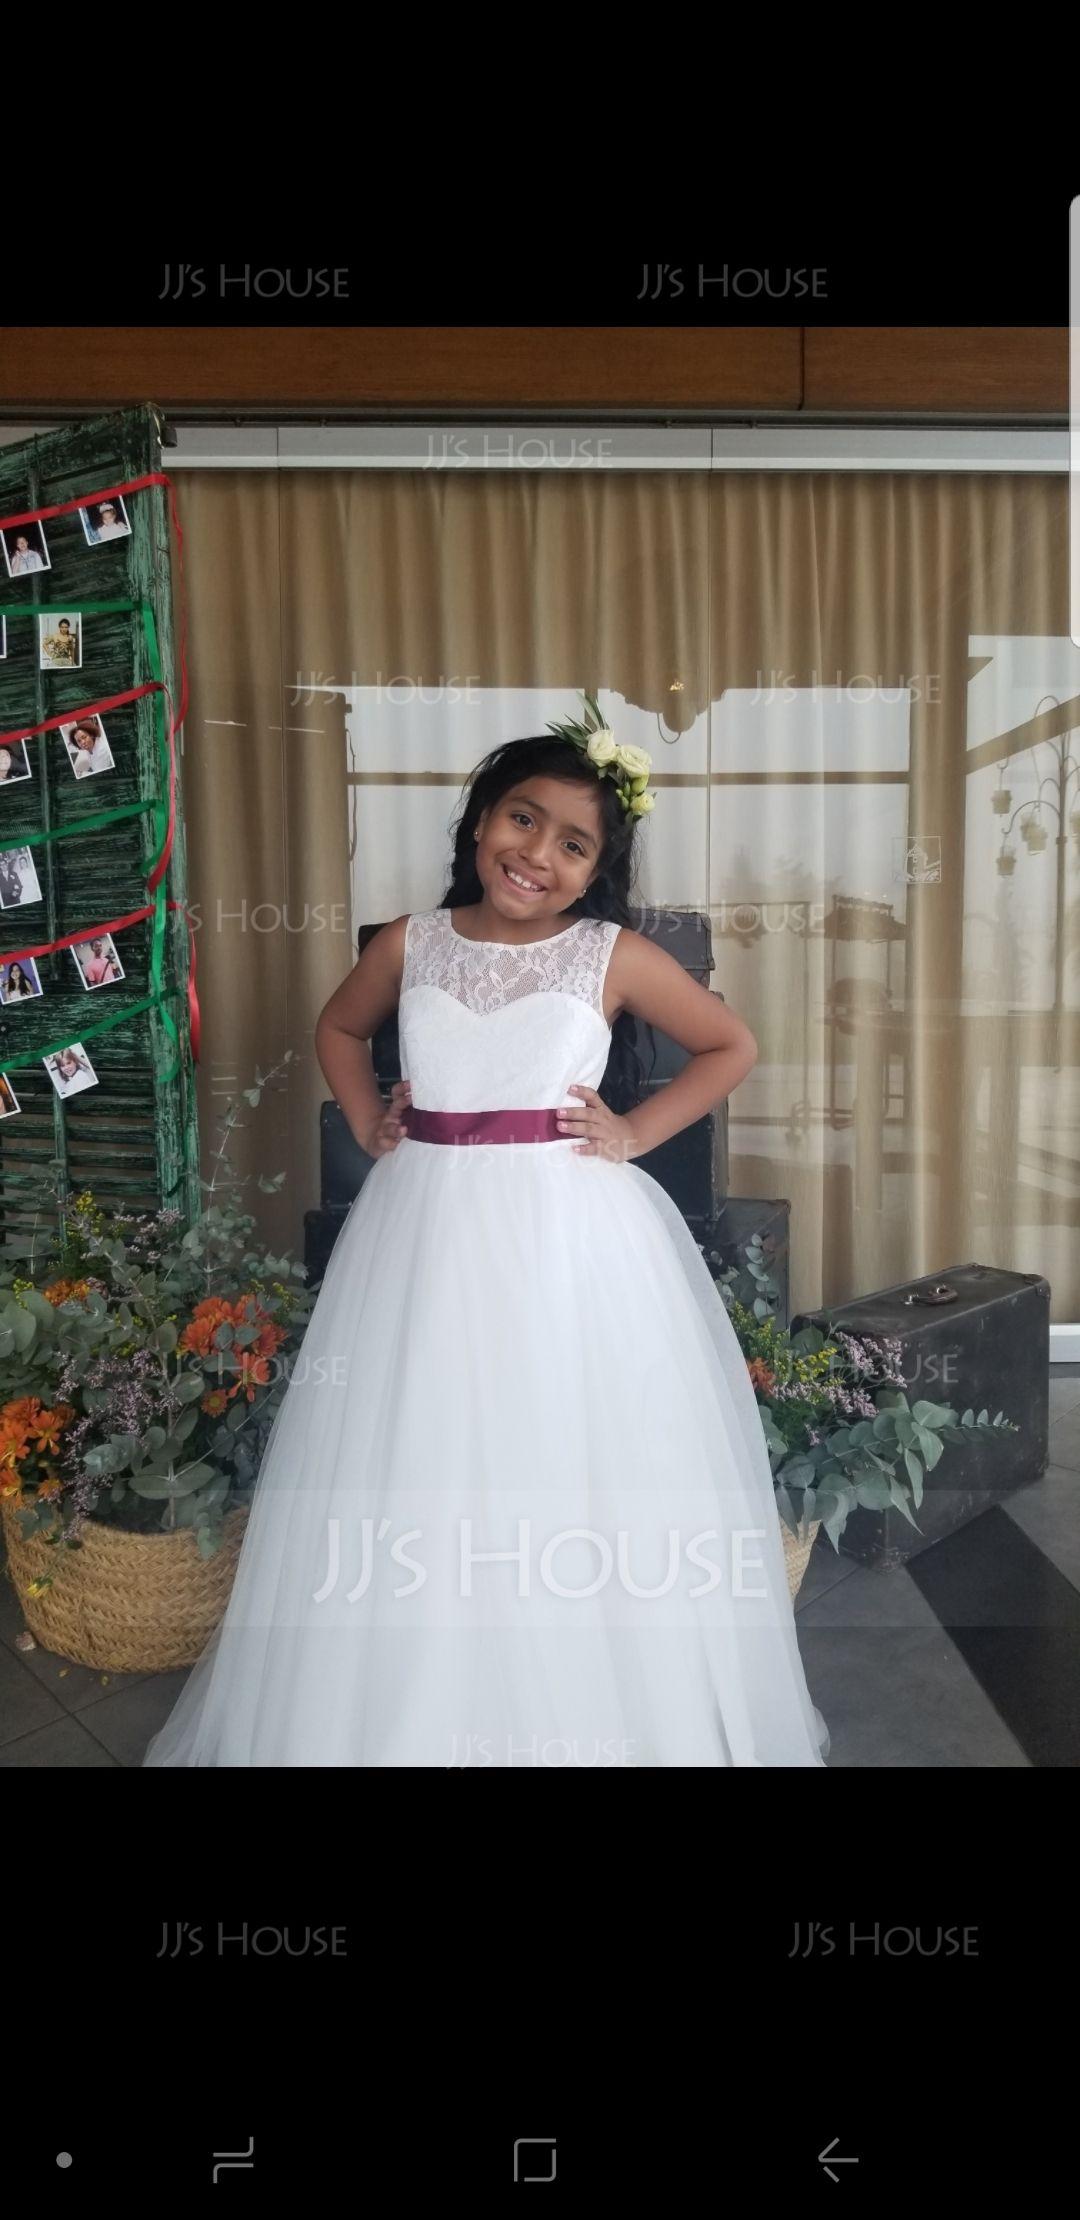 2ab3c49af93 A-Line Princess Floor-length Flower Girl Dress - Satin Tulle Lace  Sleeveless Scoop Neck With Sash (010106124) - Flower Girl Dresses - JJ s  House